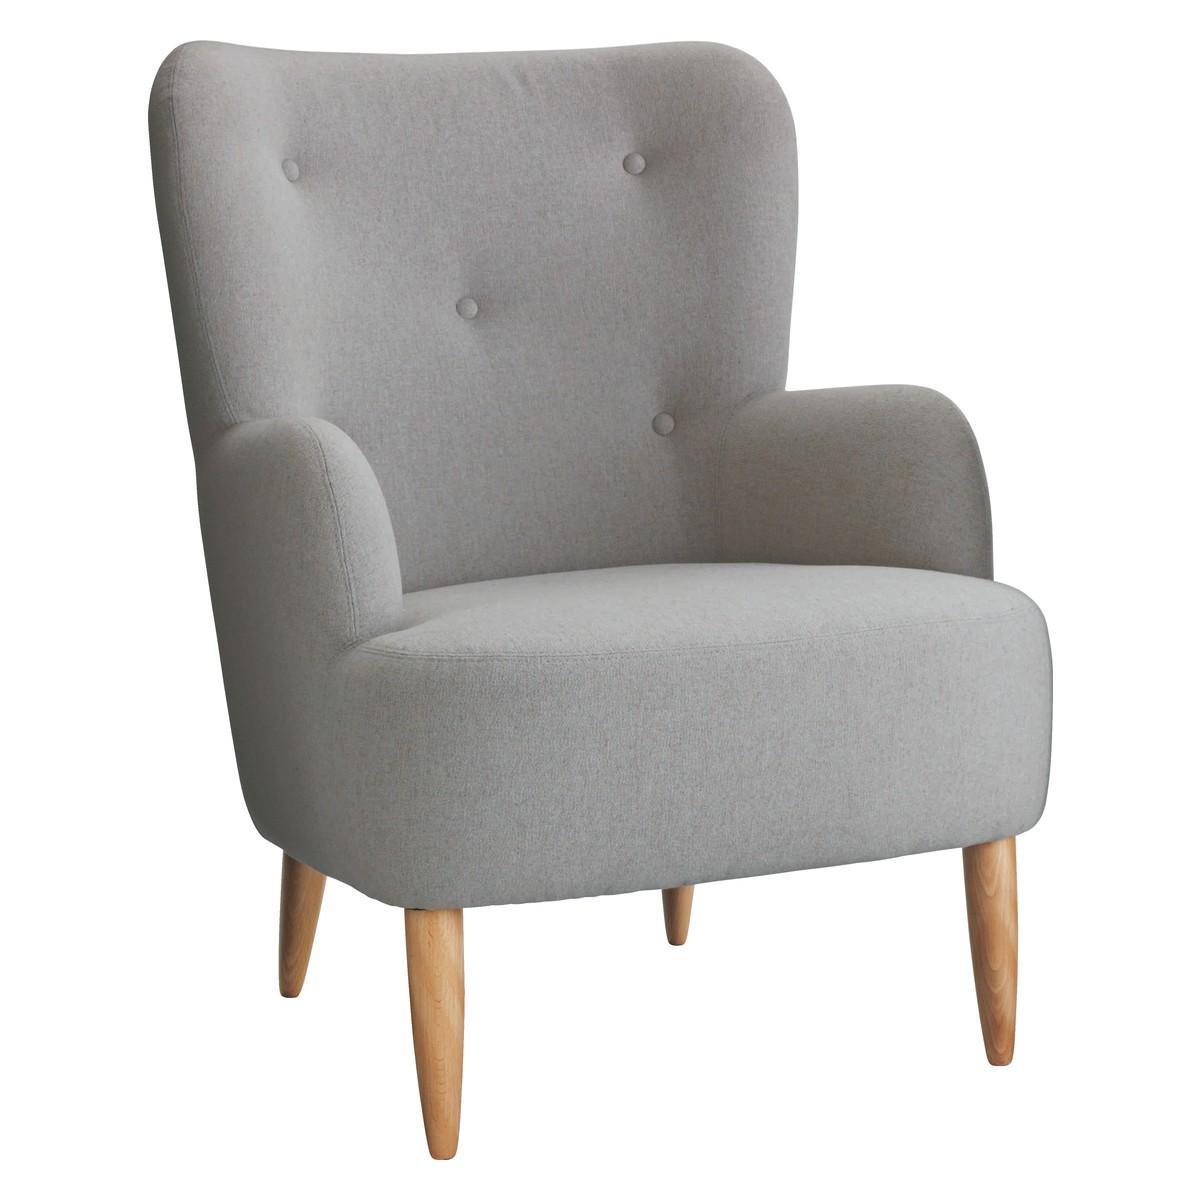 sofa的意思_【armchair】什么意思_英语armchair的翻译_音标_读音_用法_例句_在线 ...